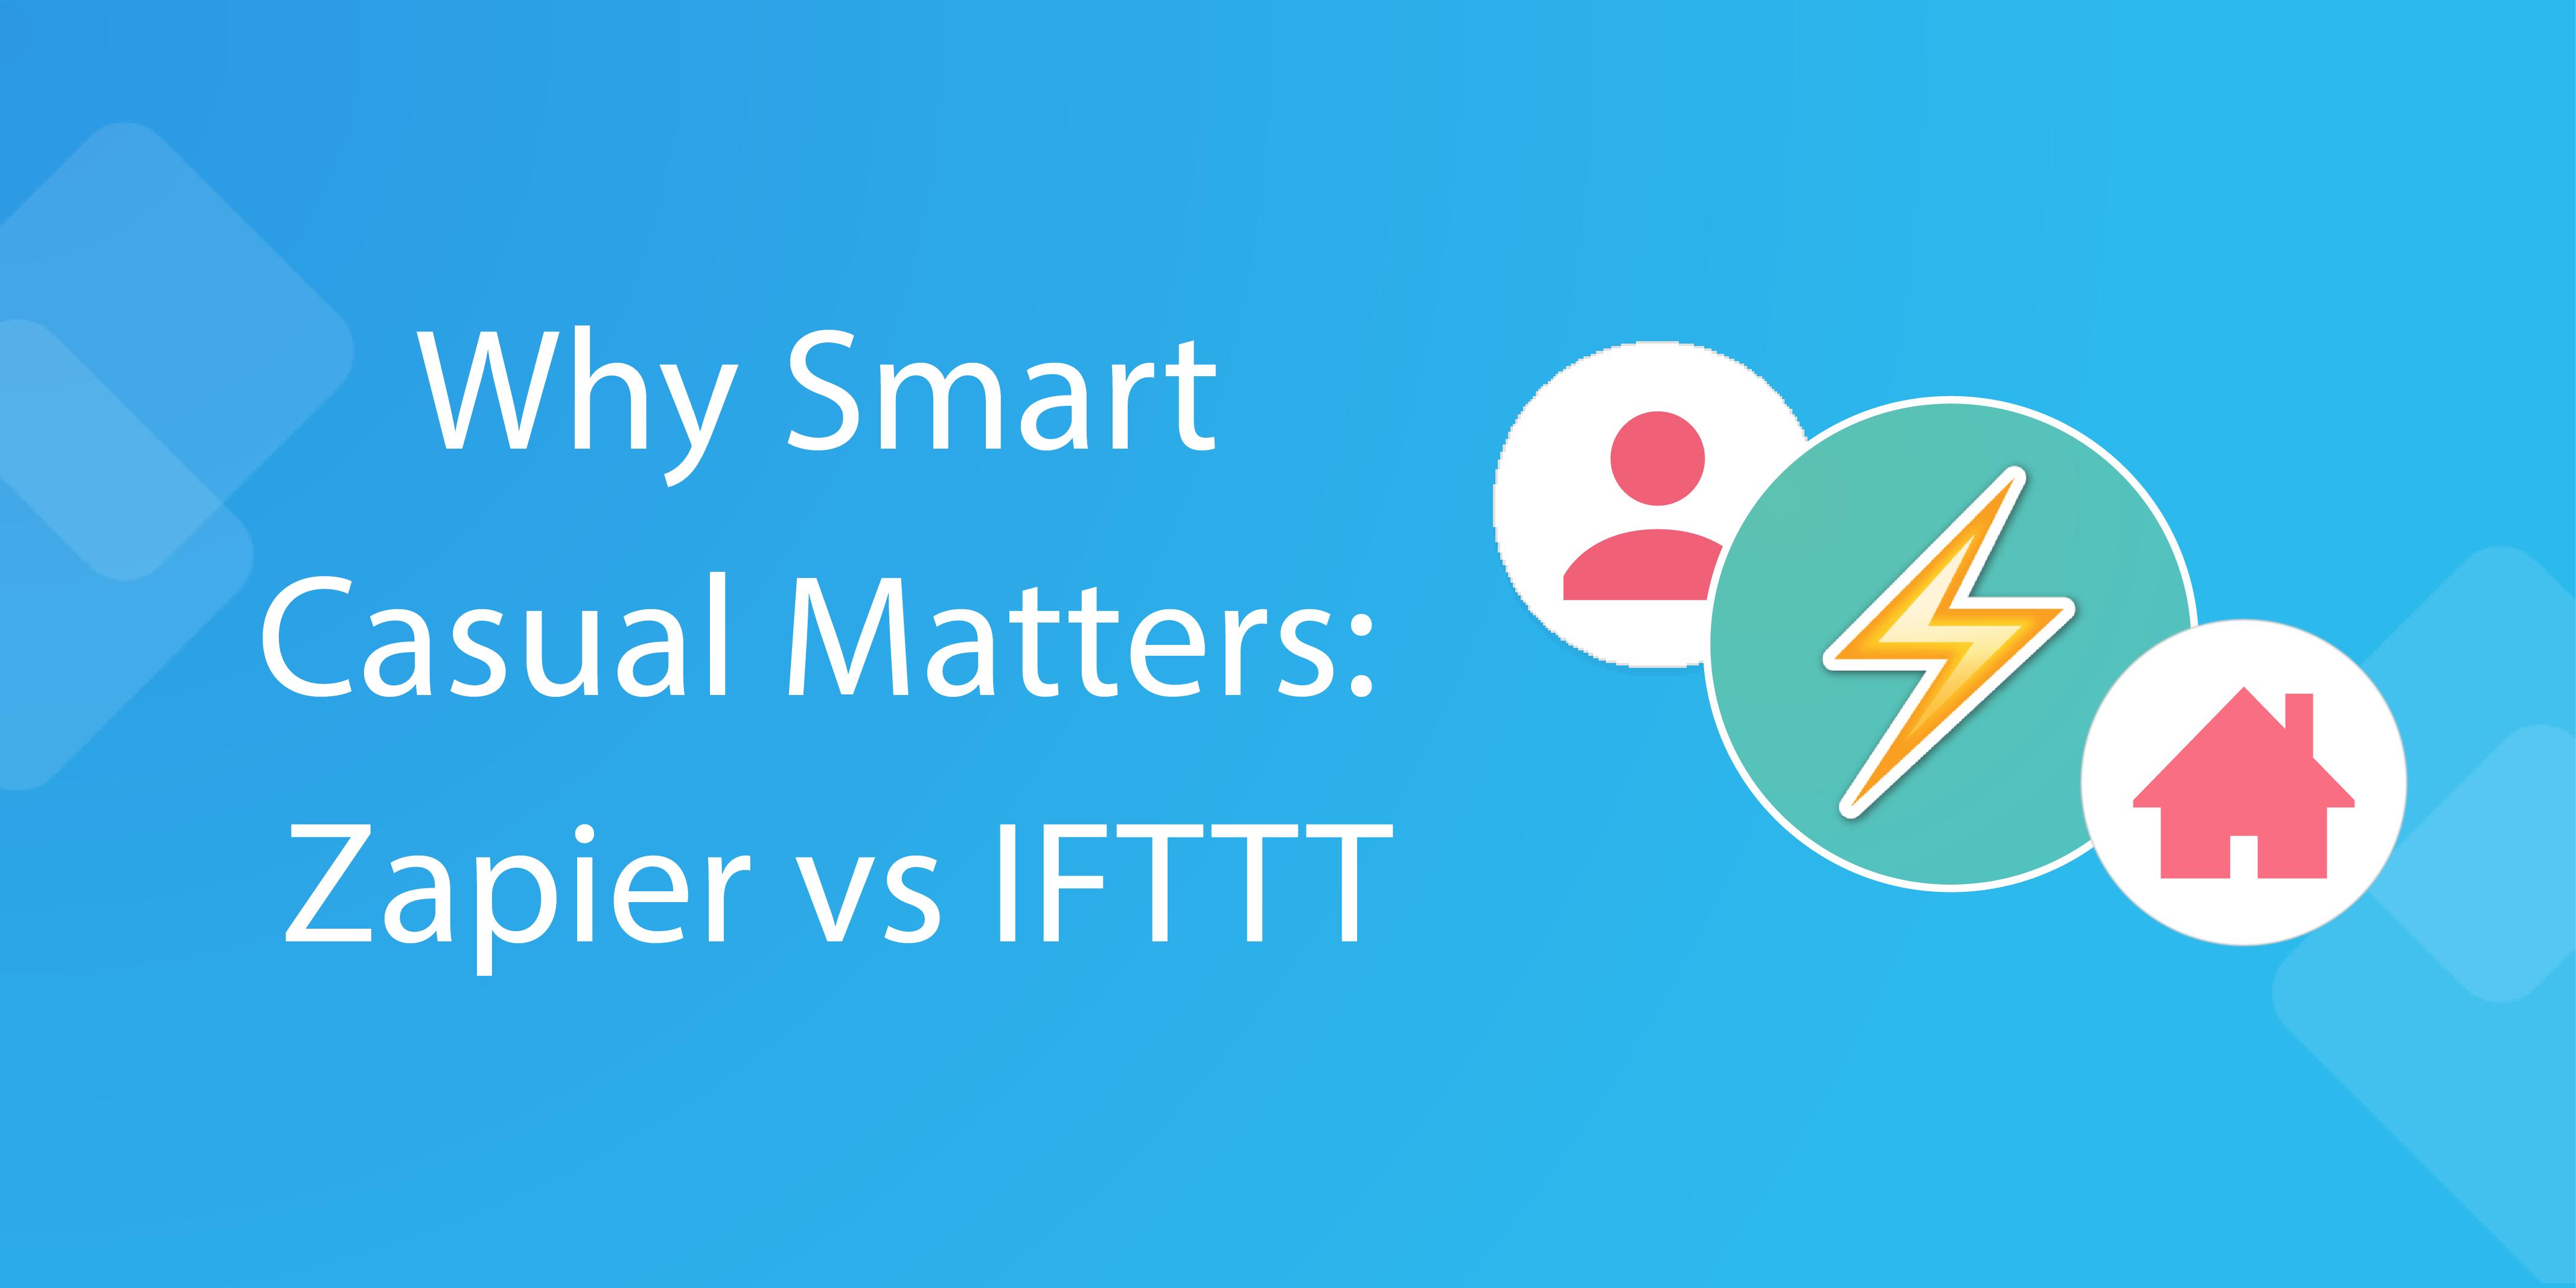 zapier vs ifttt - header